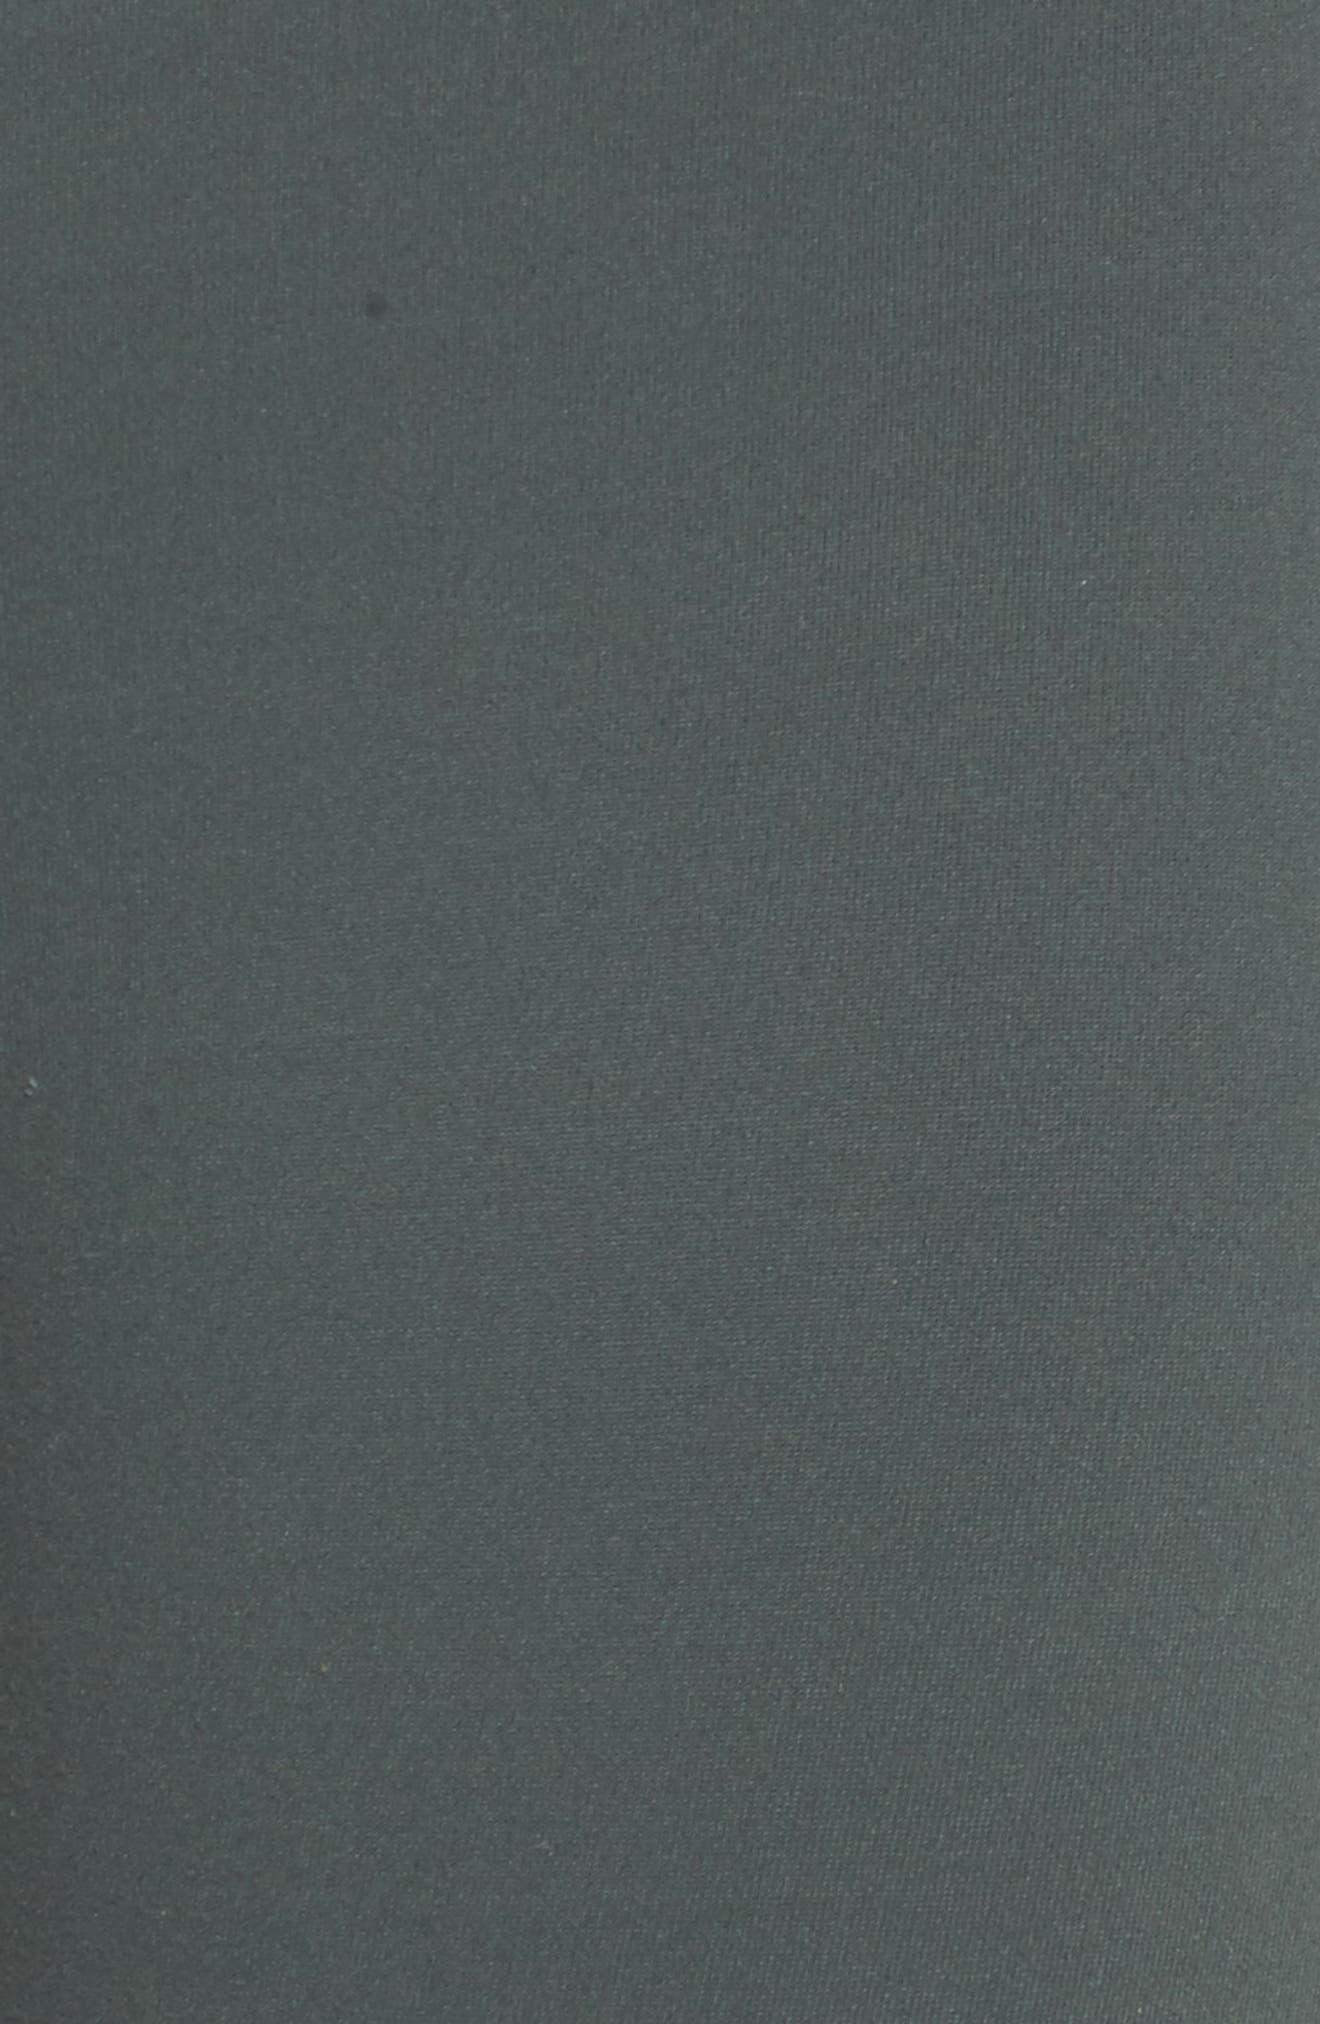 Back Track High Waist Midi Leggings,                             Alternate thumbnail 6, color,                             Grey Urban